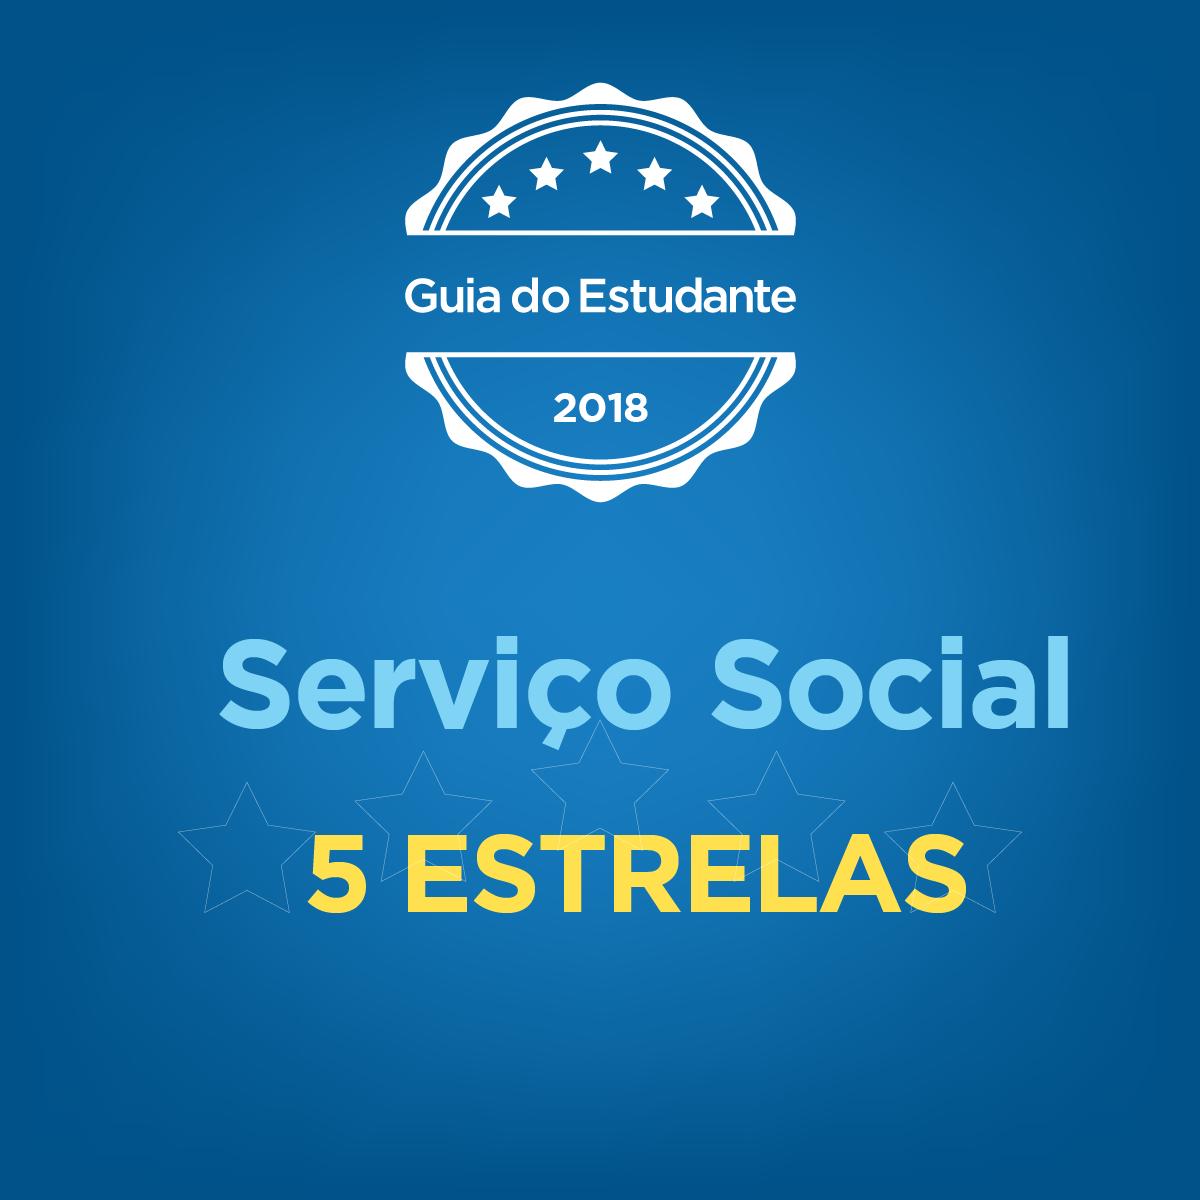 guia-estudante-servico_social